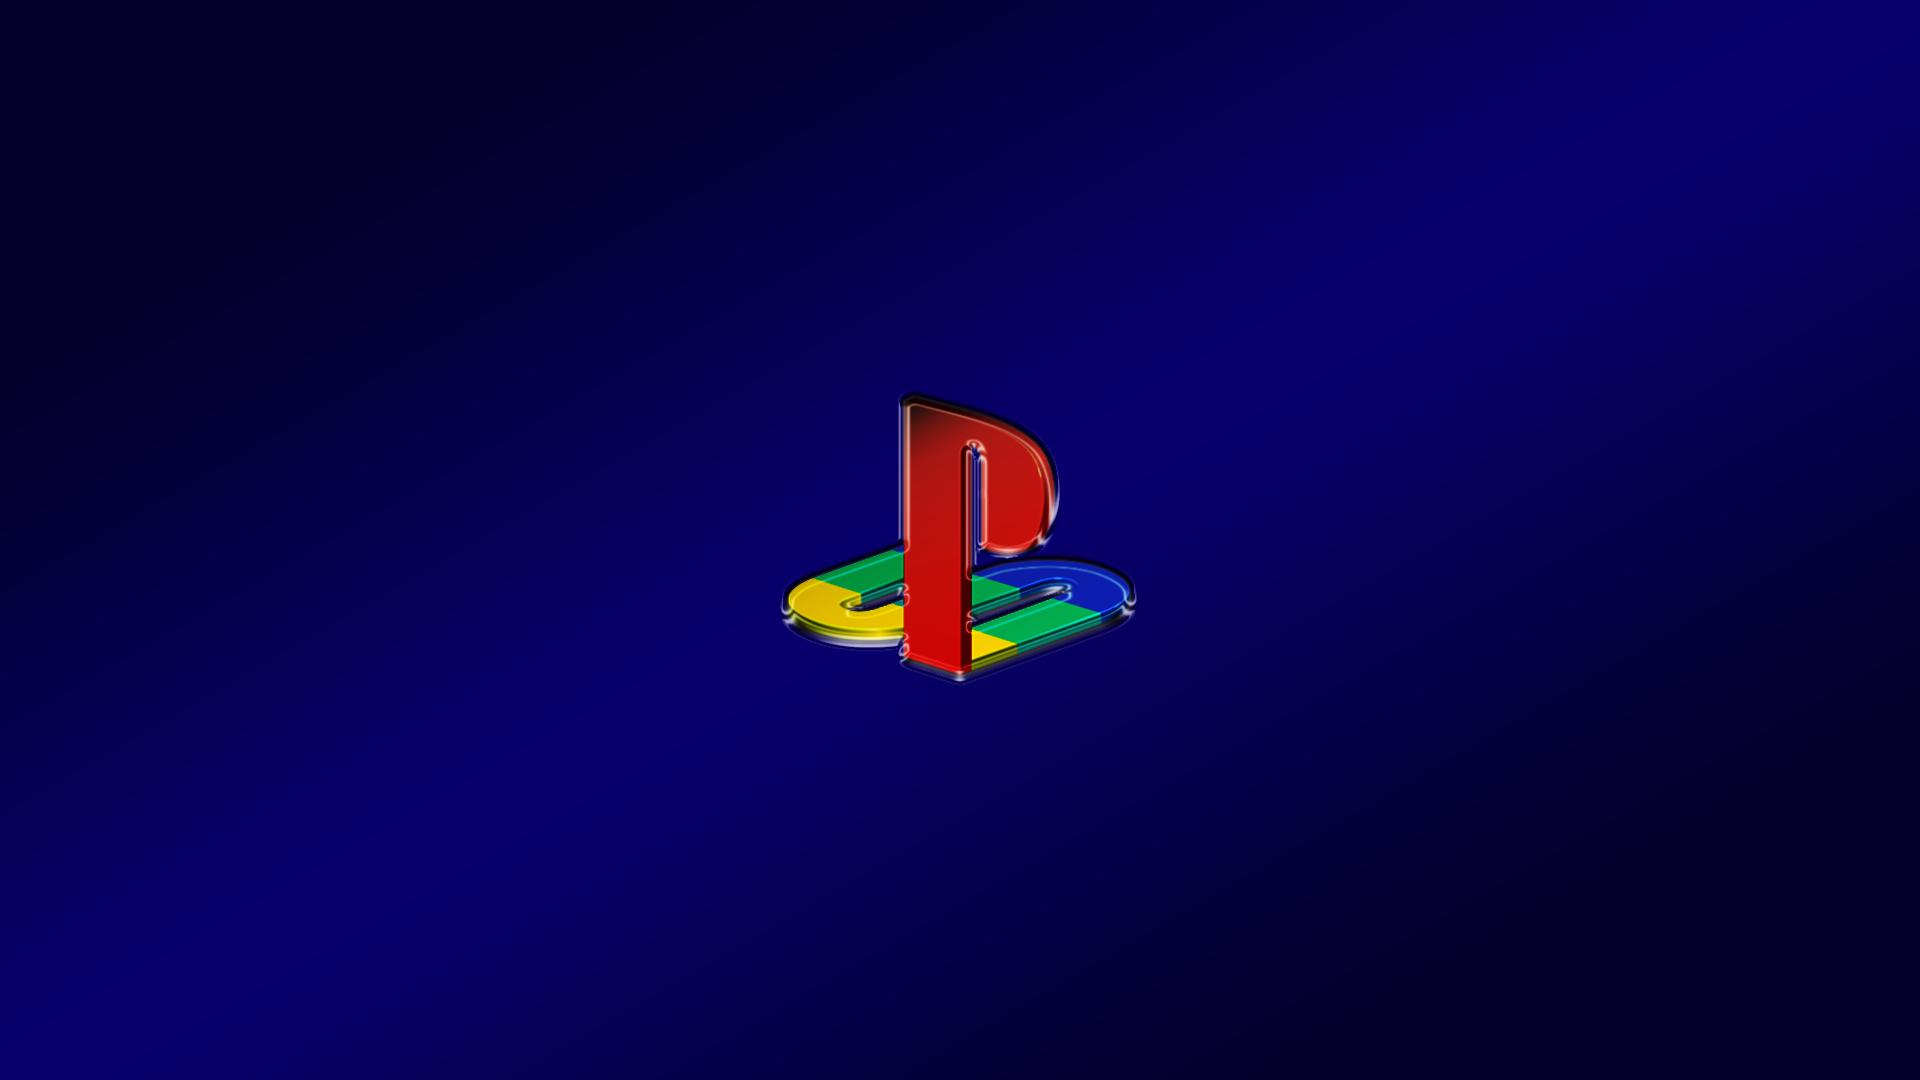 Playstation Wallpaper 30 1920x1080 768x432